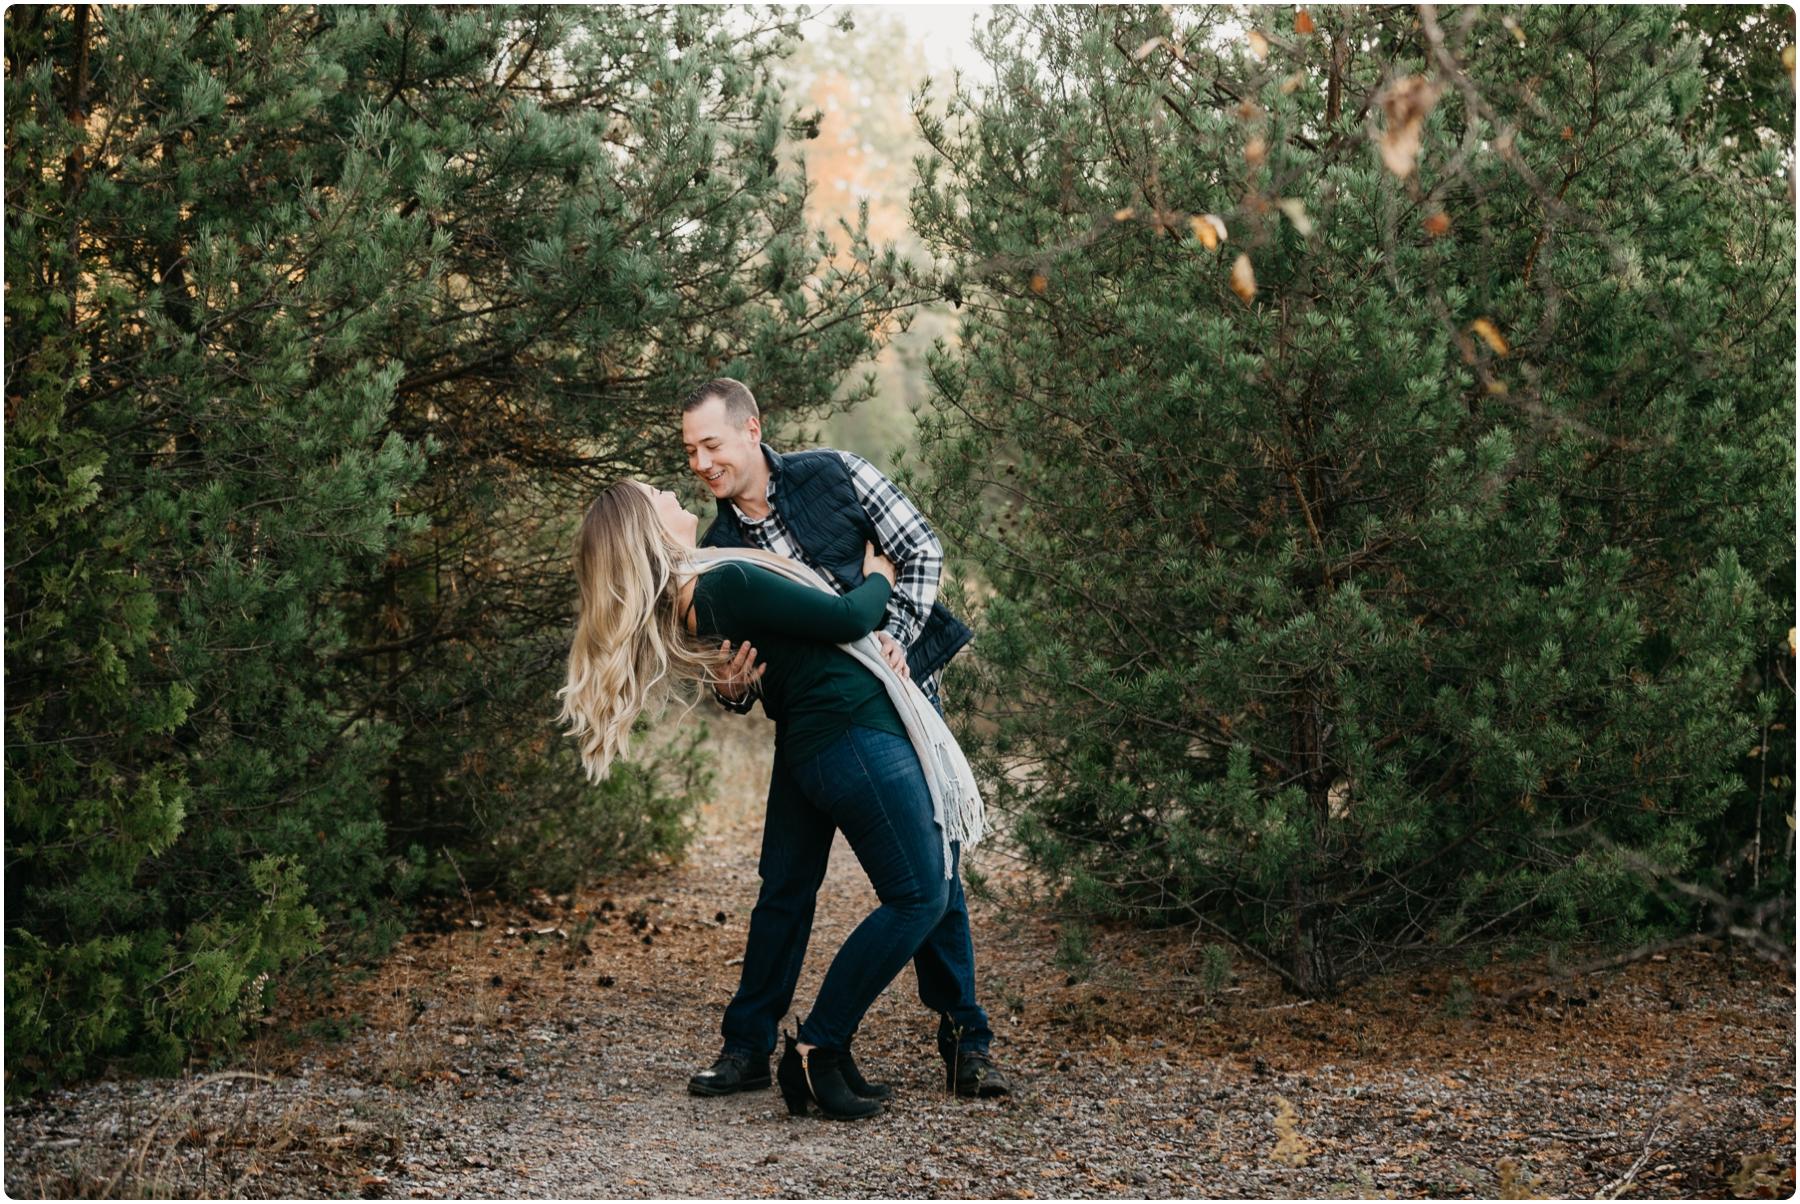 Katerine & Chris Greenwood engagement_0036